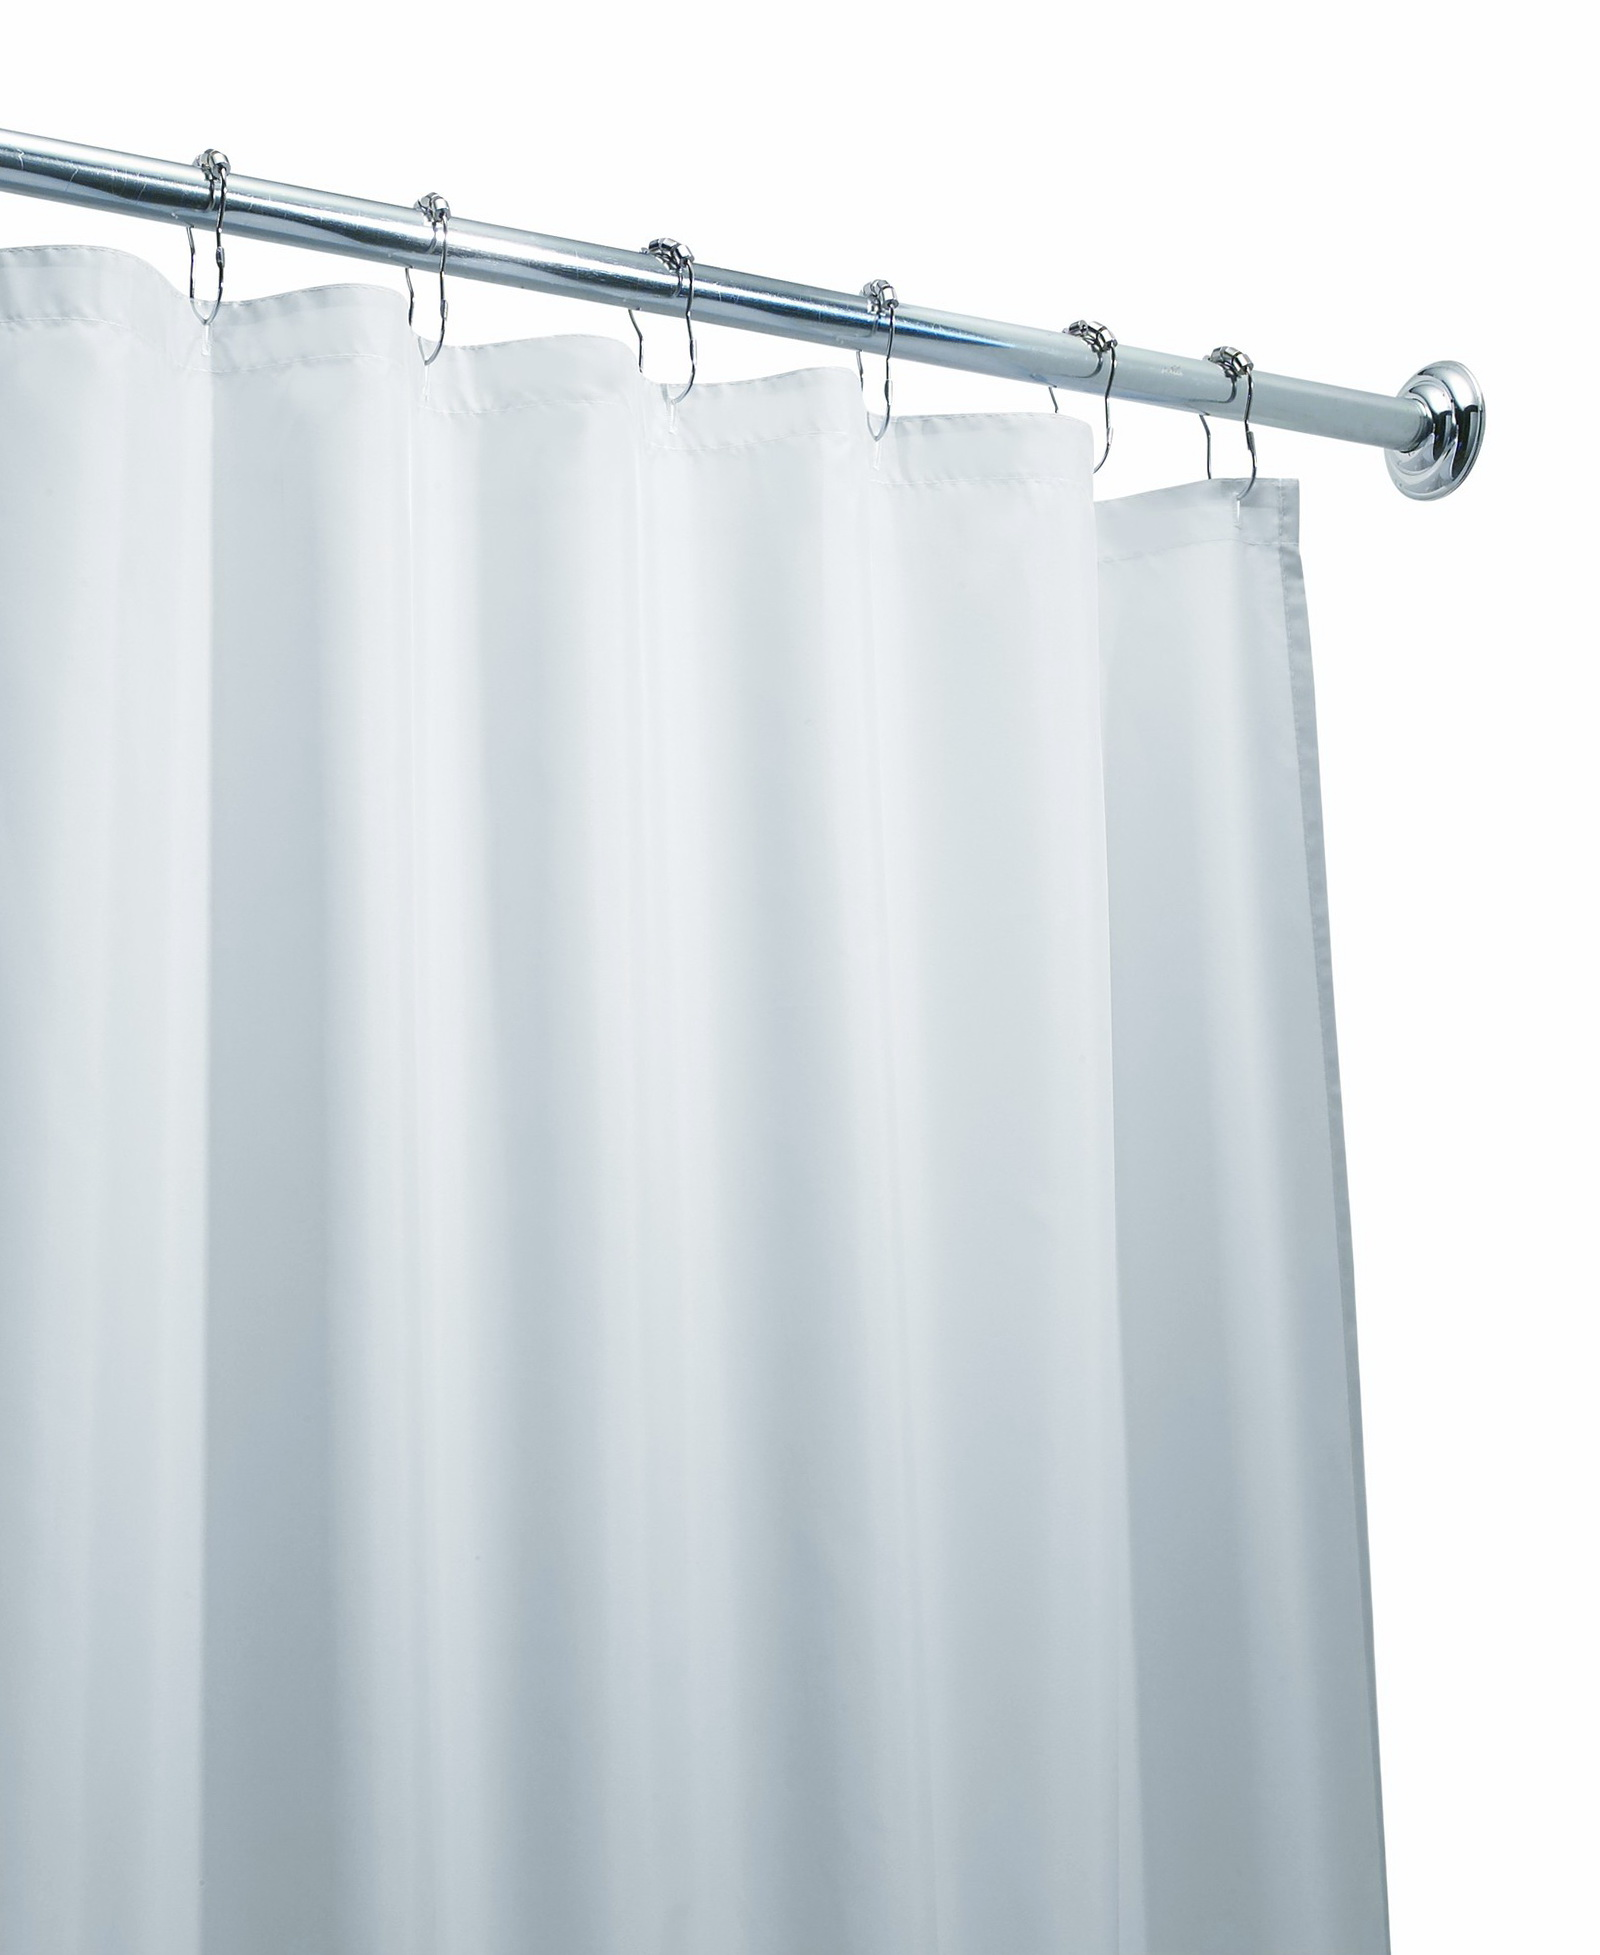 Long Curtain Rods Walmart